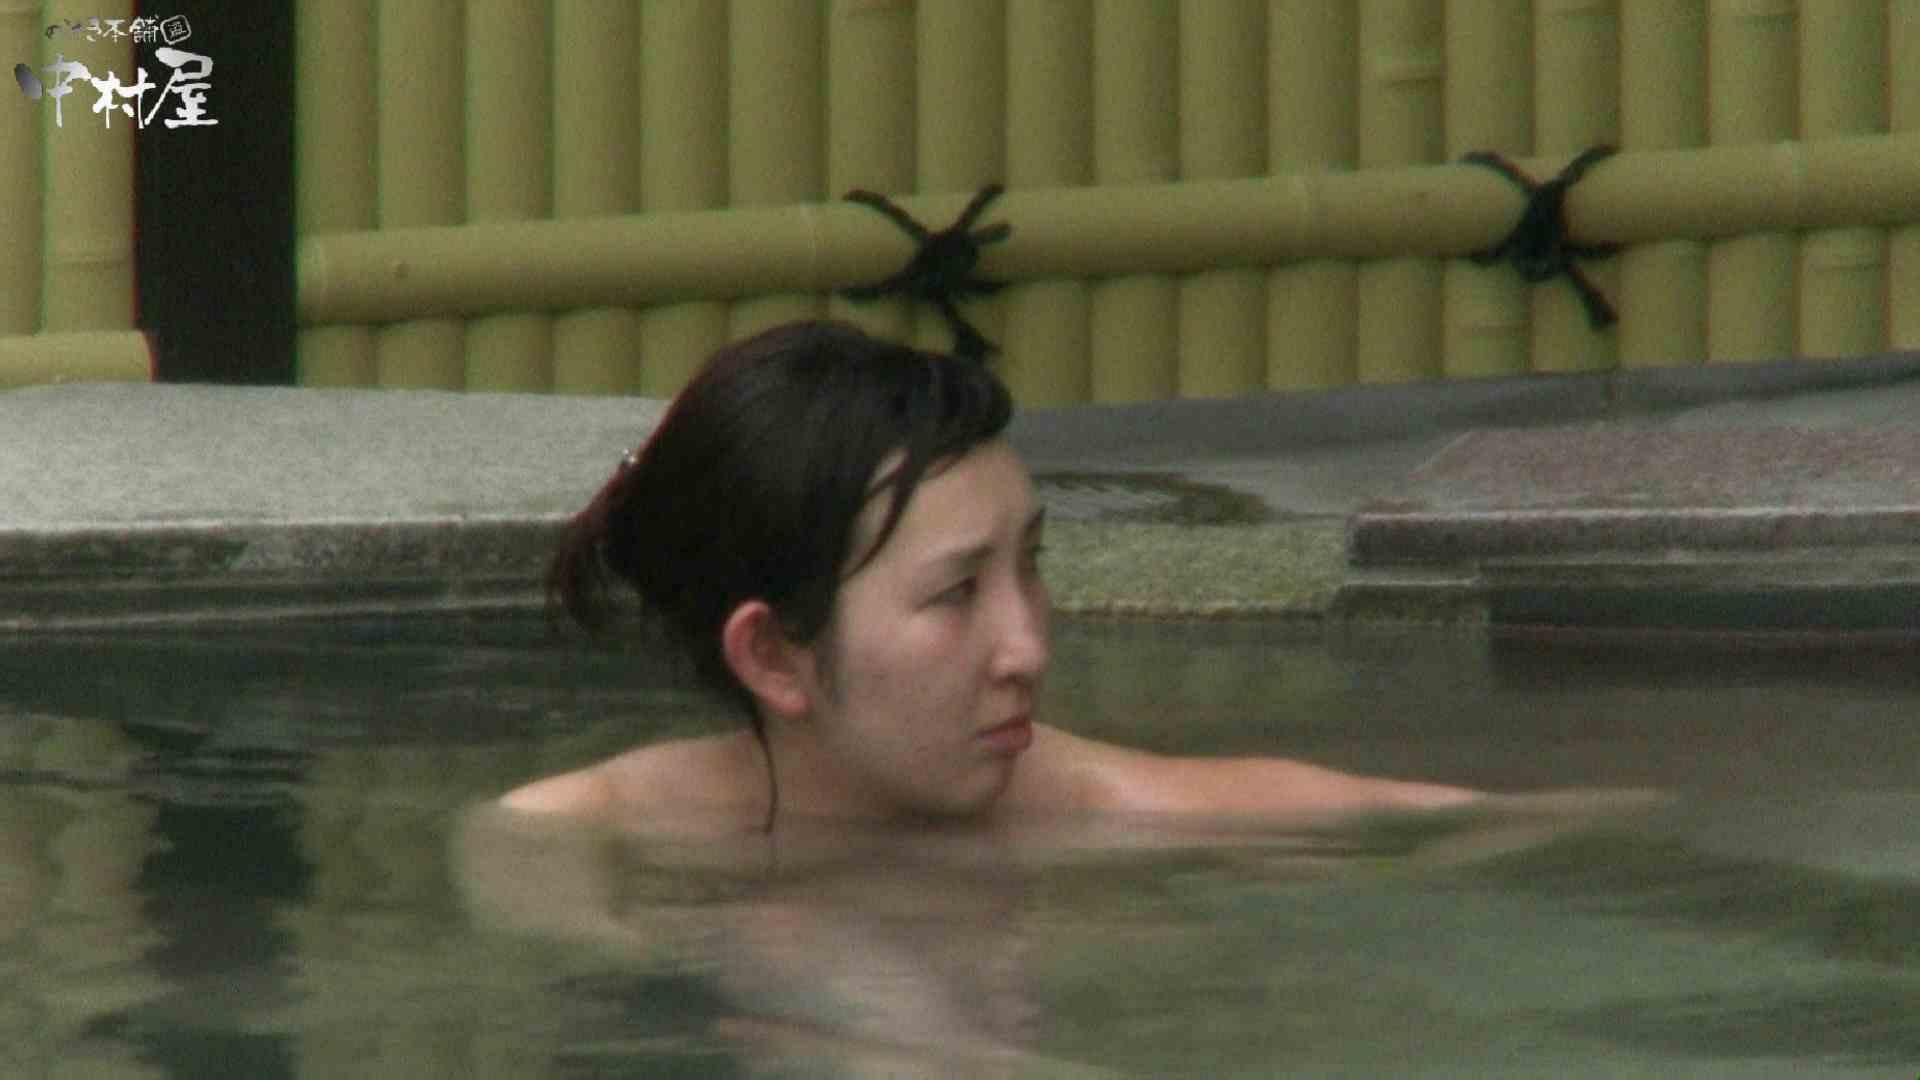 Aquaな露天風呂Vol.948 盗撮   HなOL  78pic 50